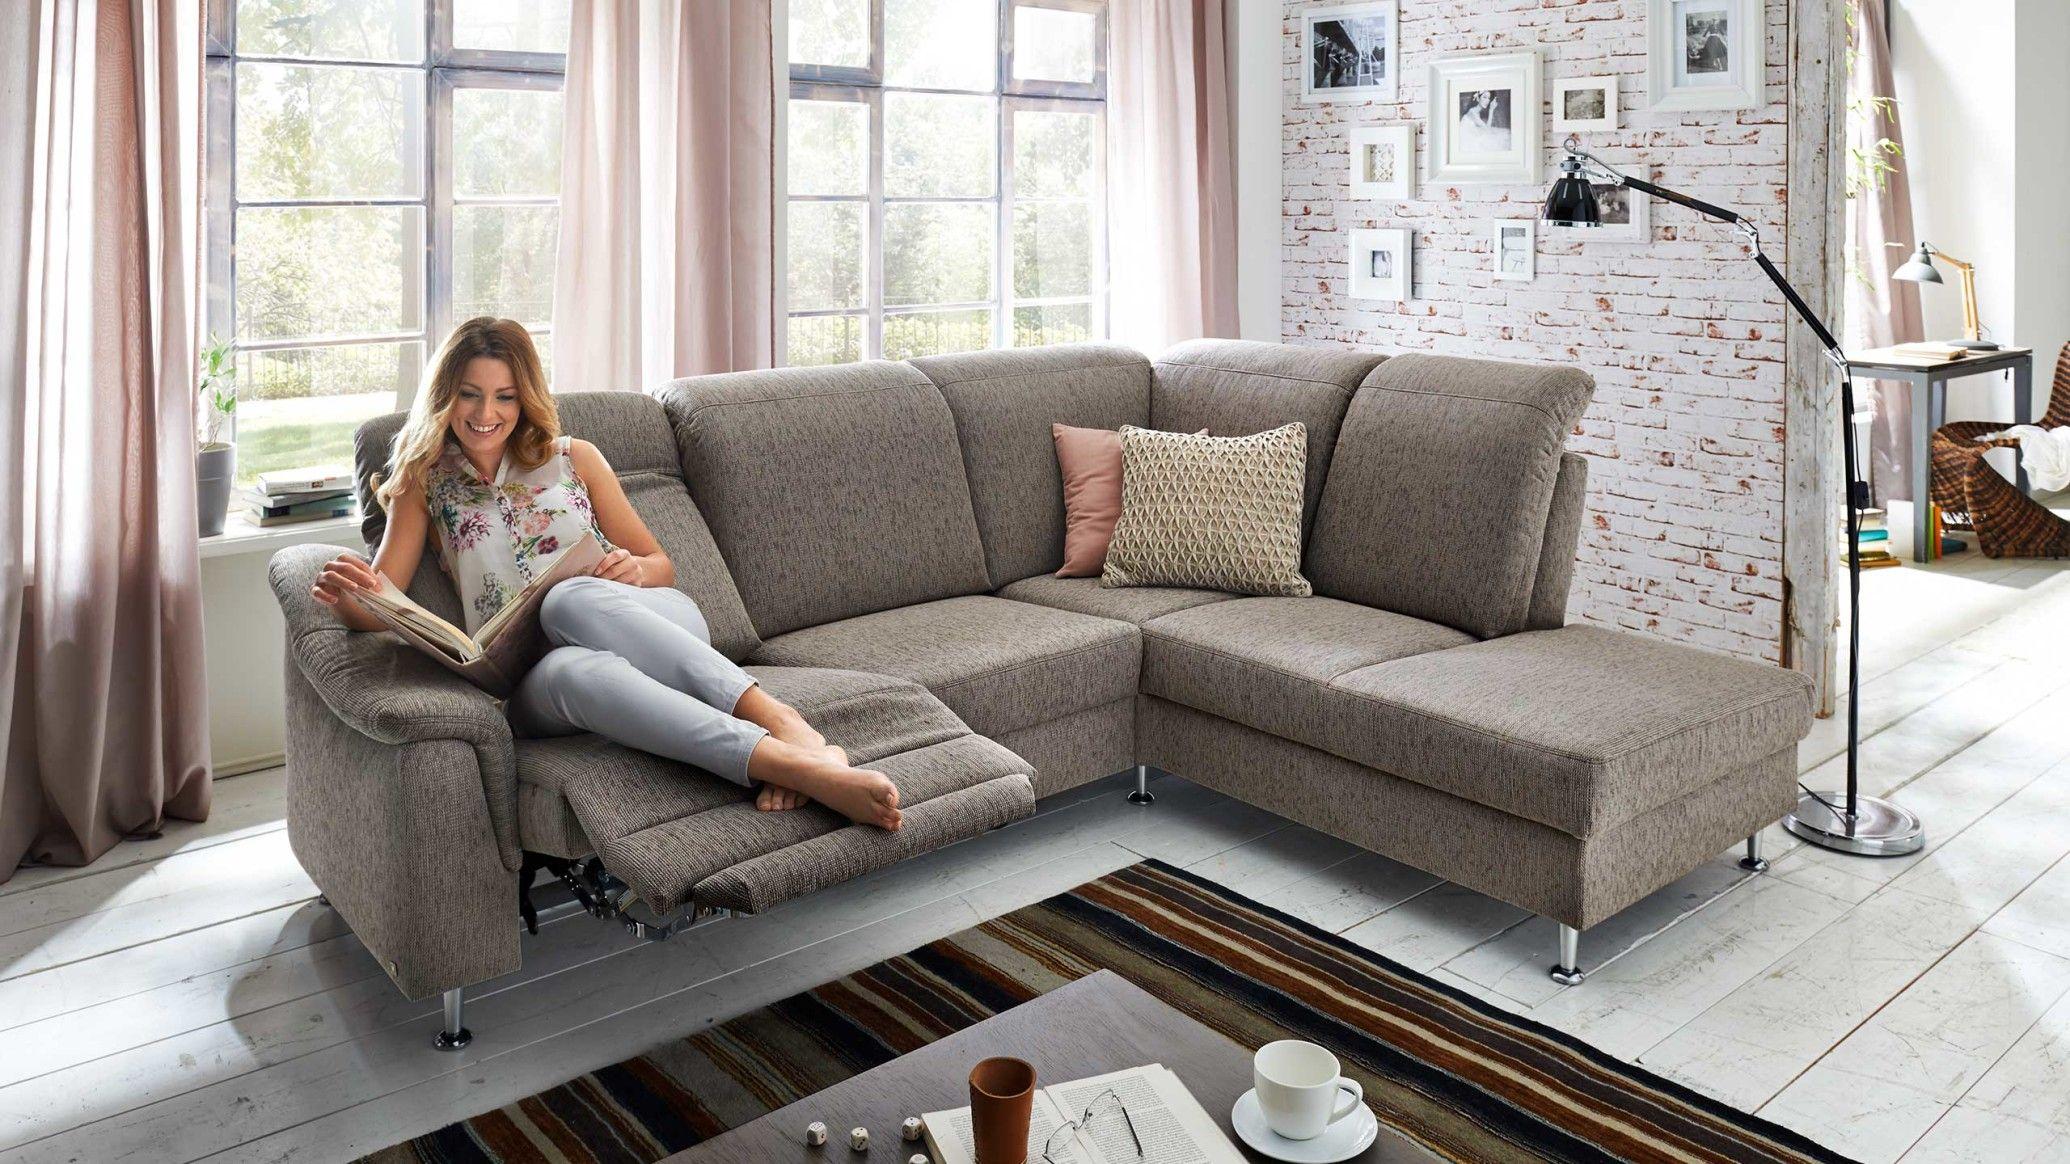 Full Size of Bezug Couch Ausklappbar Schlafsofa Bett Ausklappbares Wohnzimmer Couch Ausklappbar